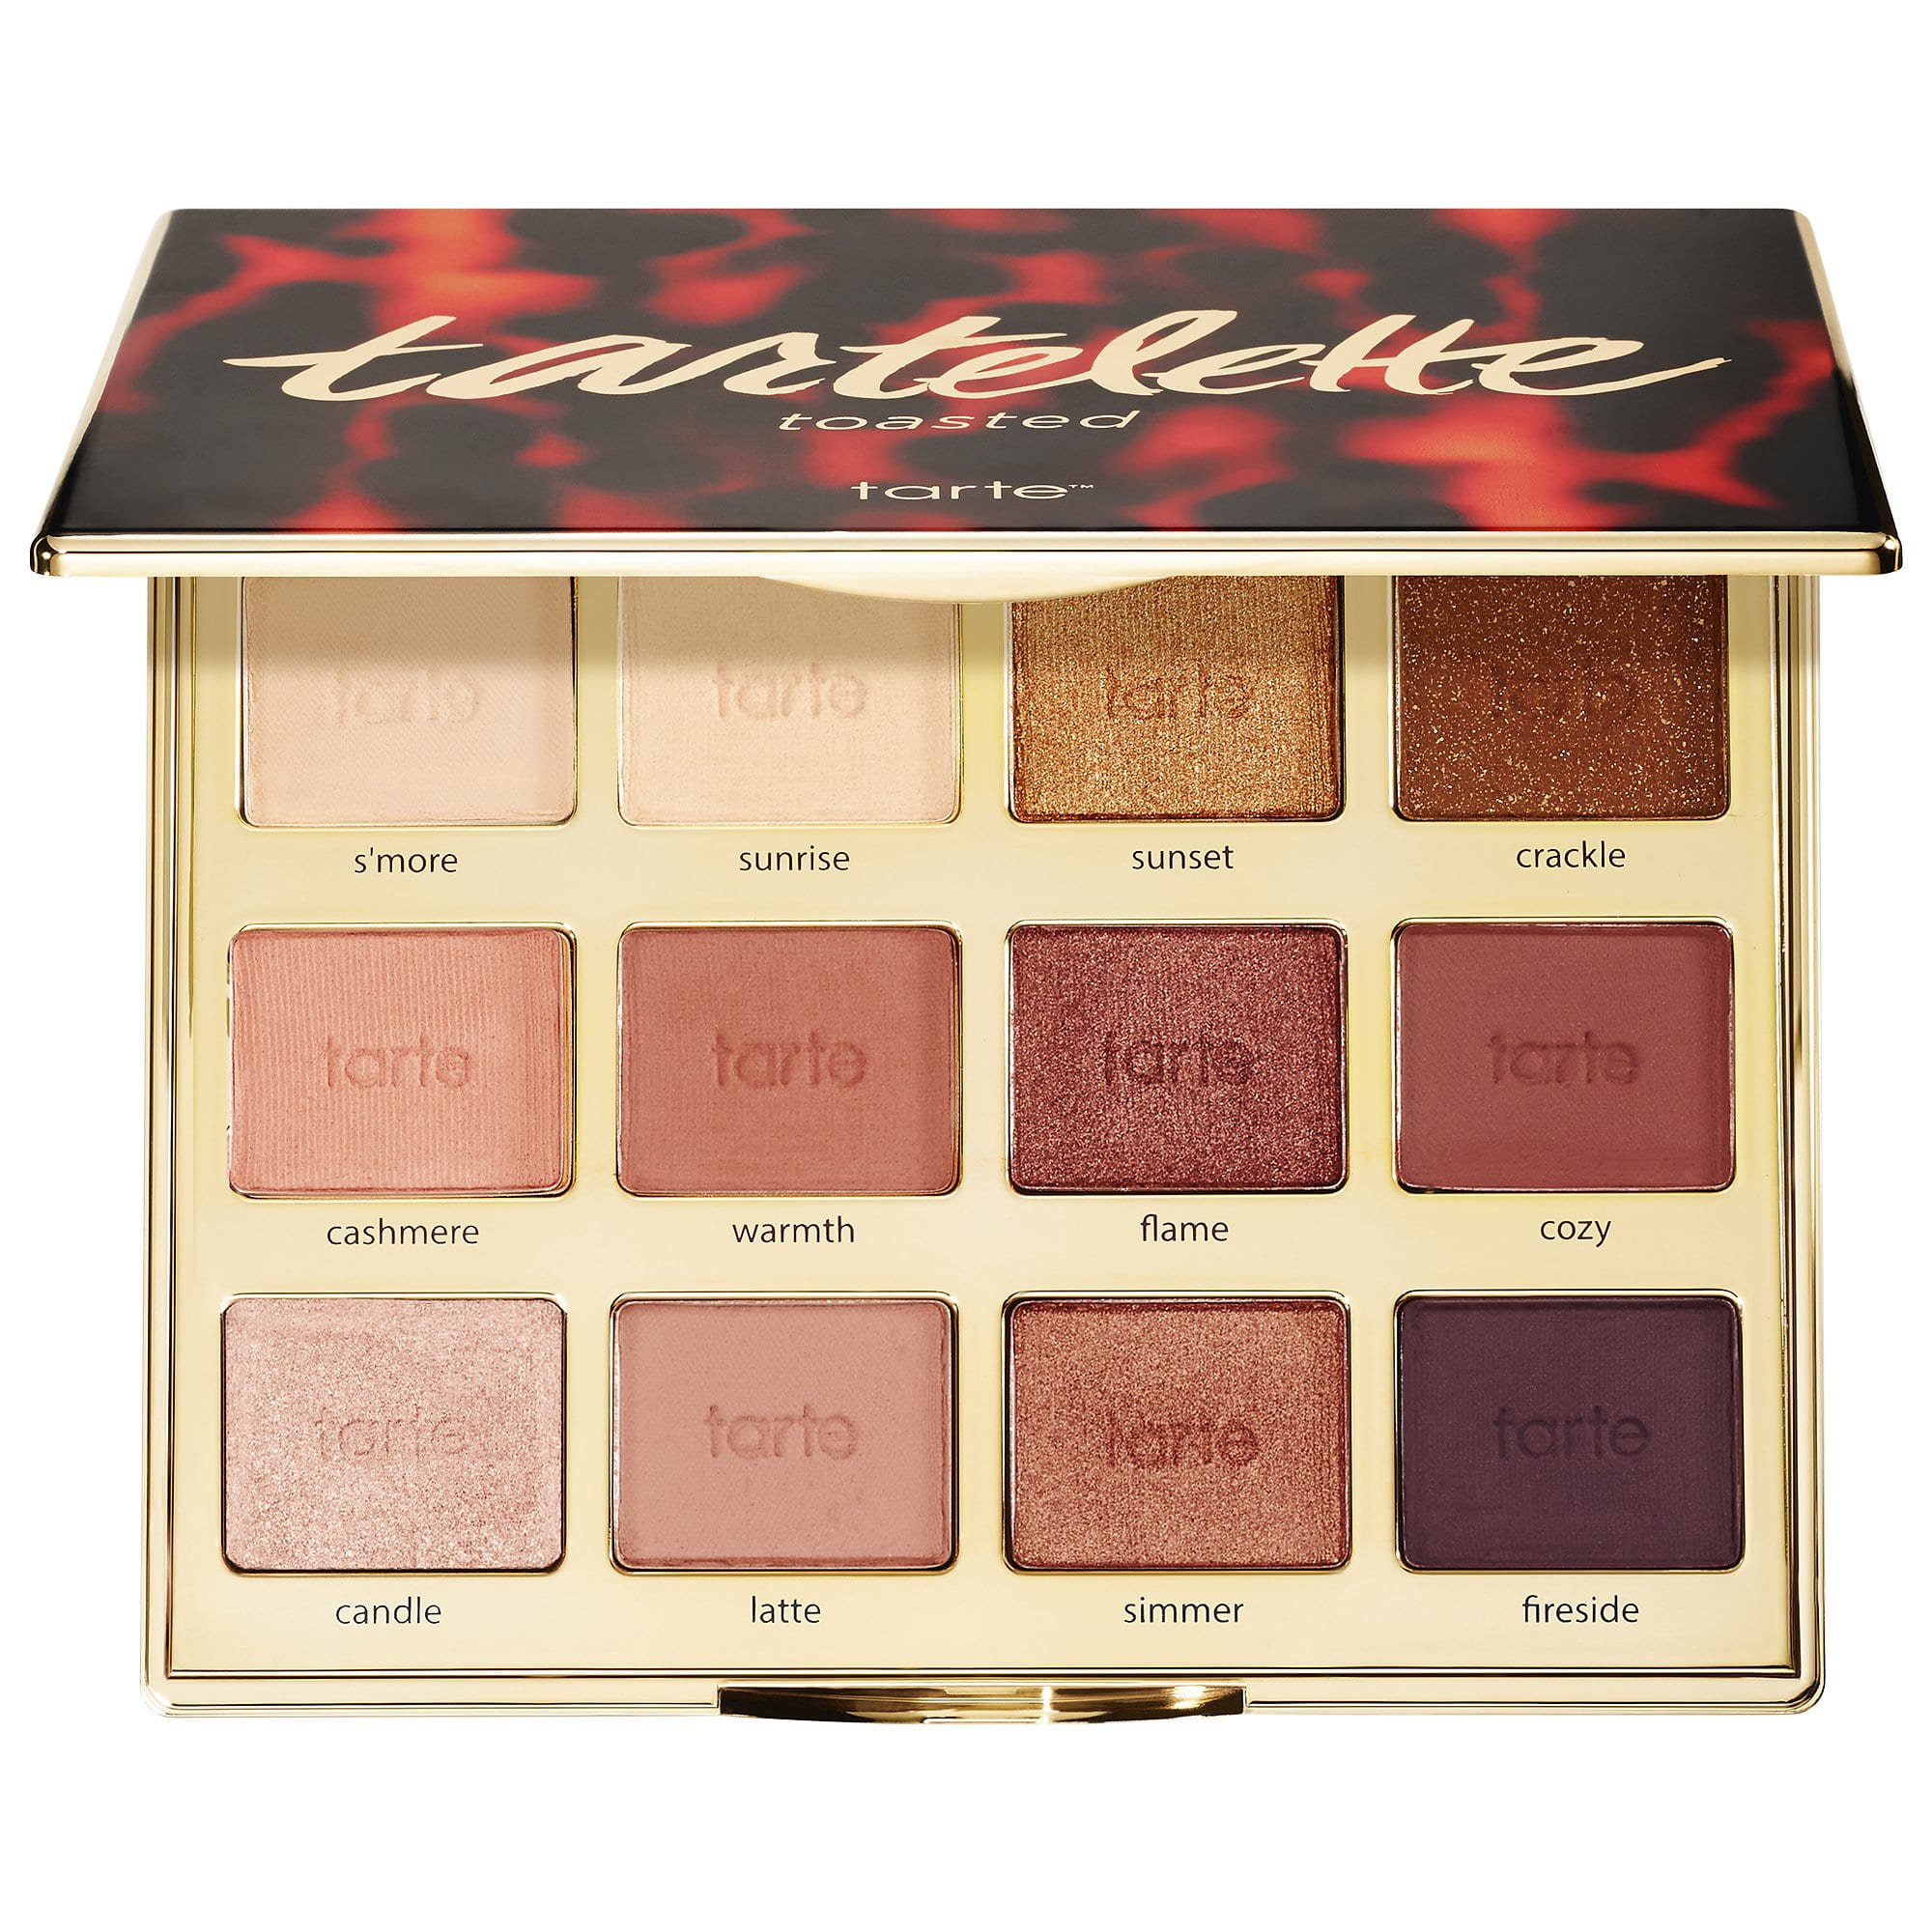 Tartelette™ Toasted Eyeshadow Palette - tarte | Sephora